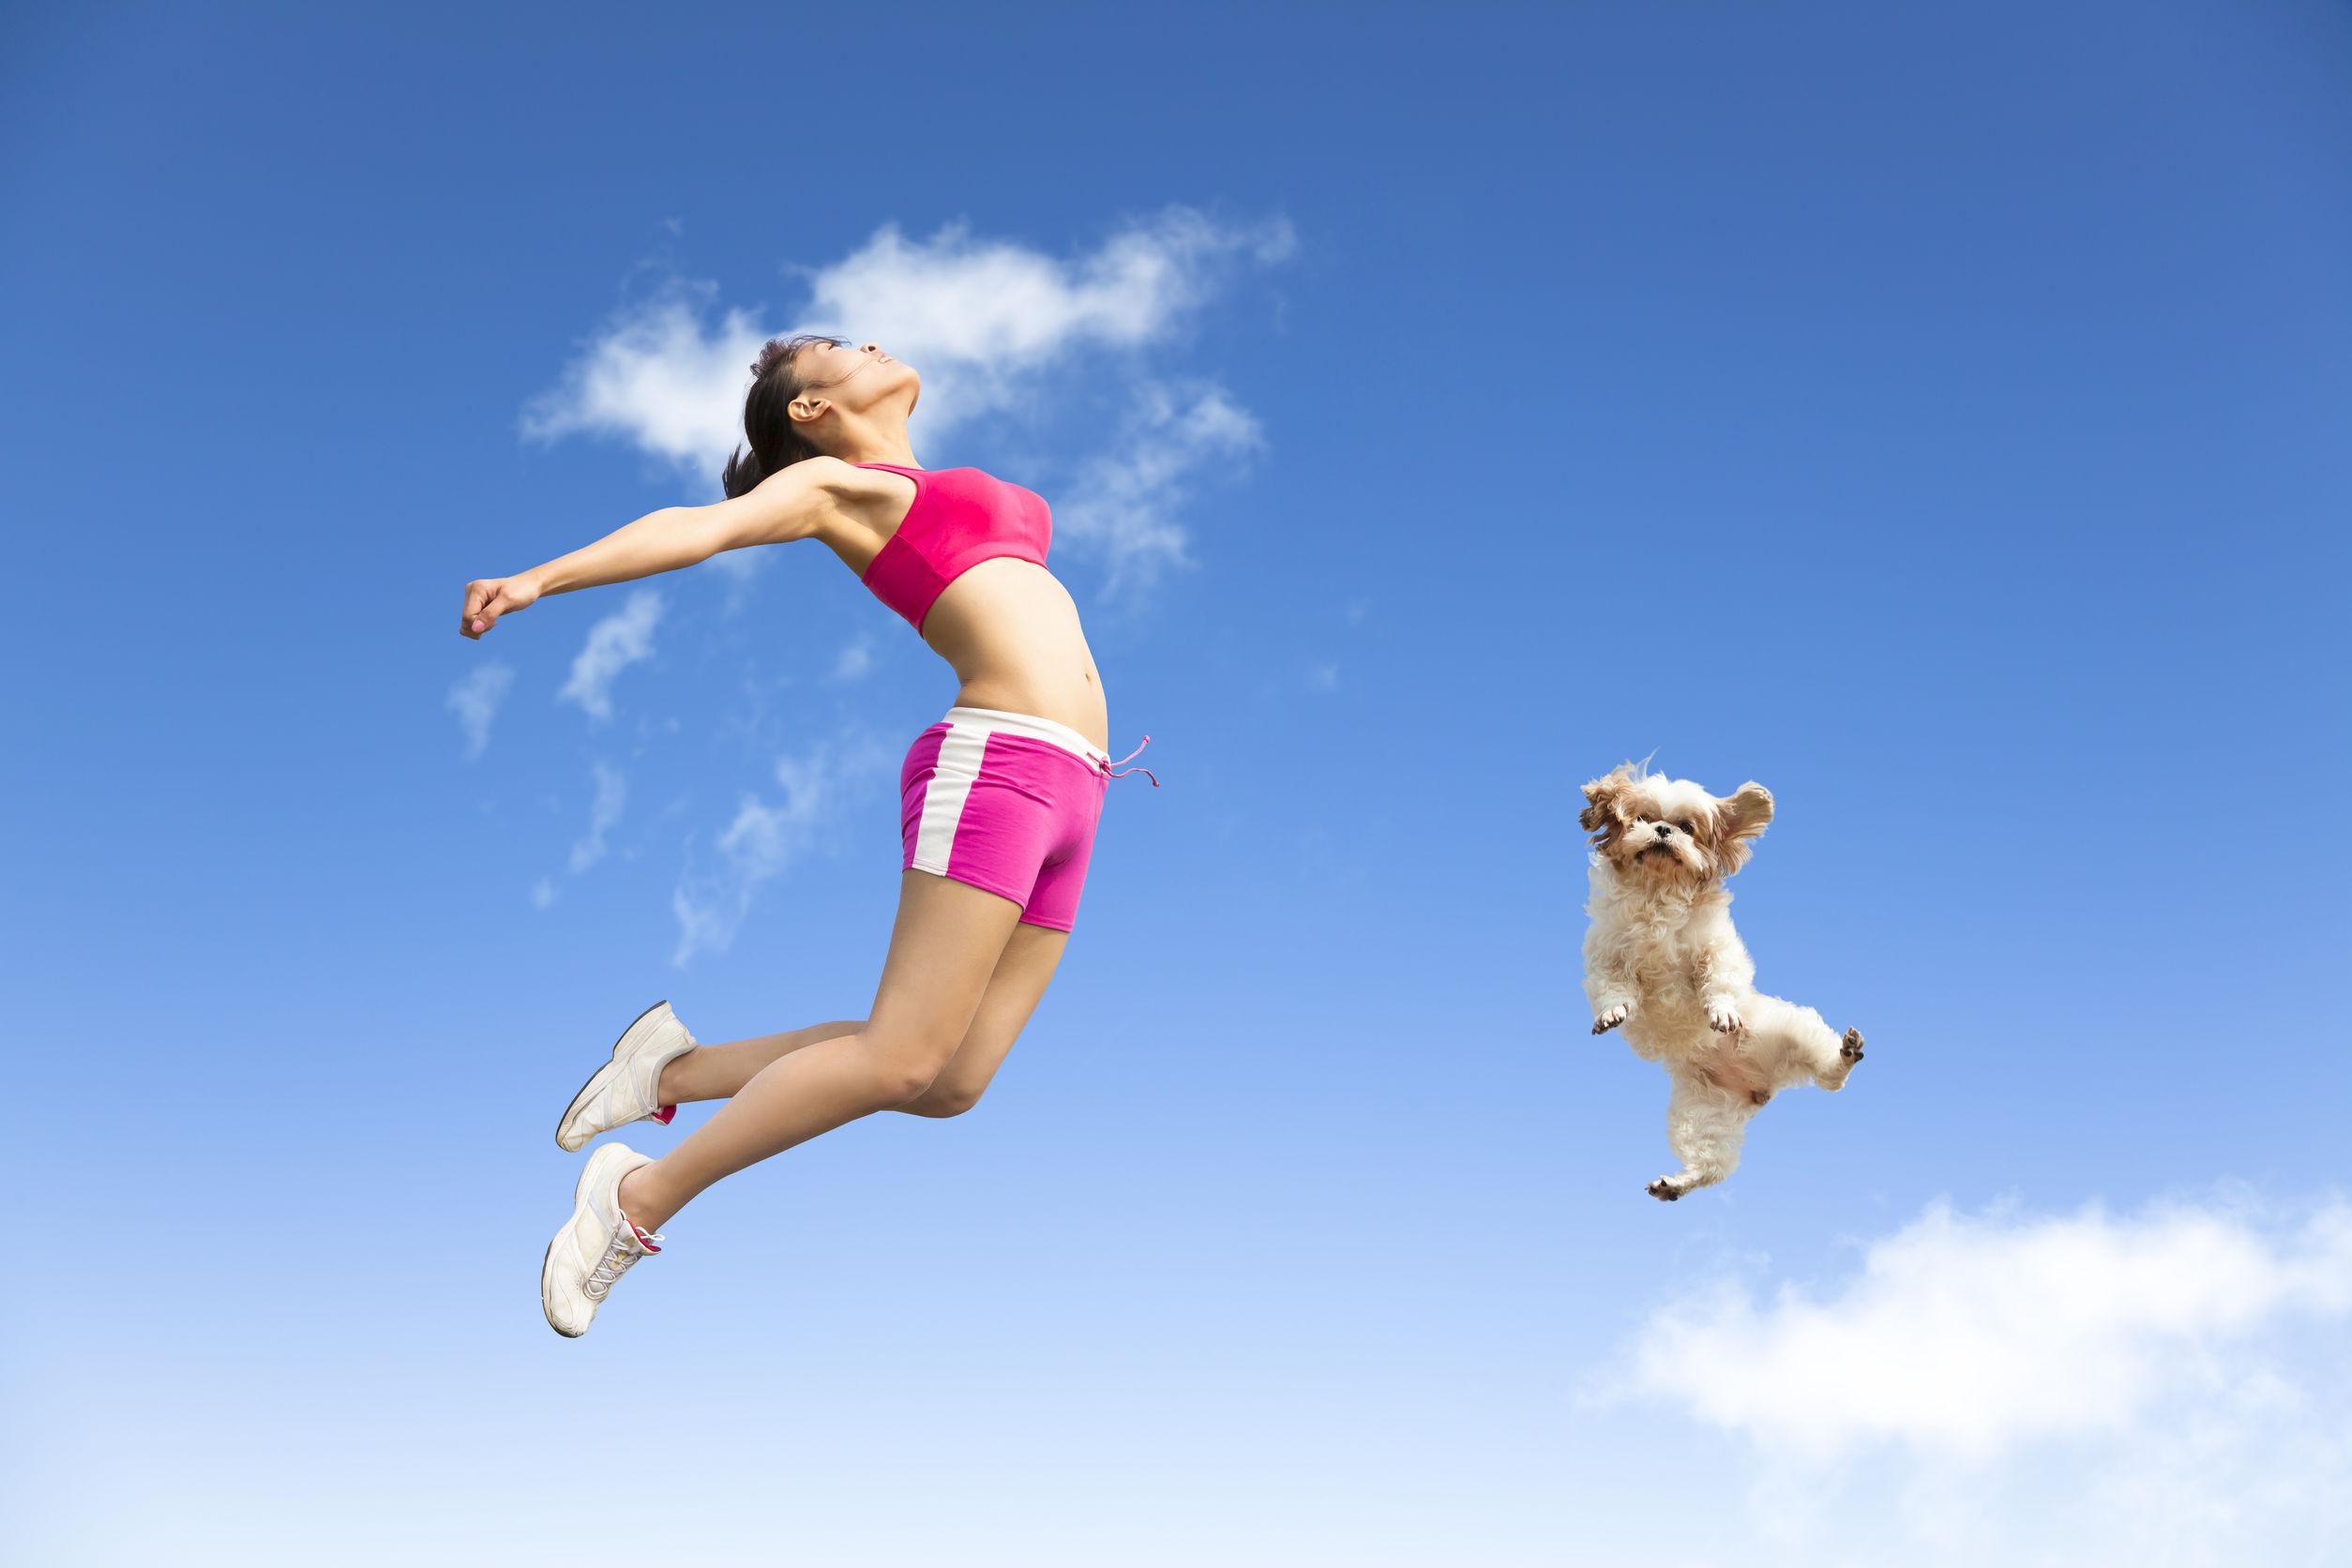 joyful-woman-and-dog